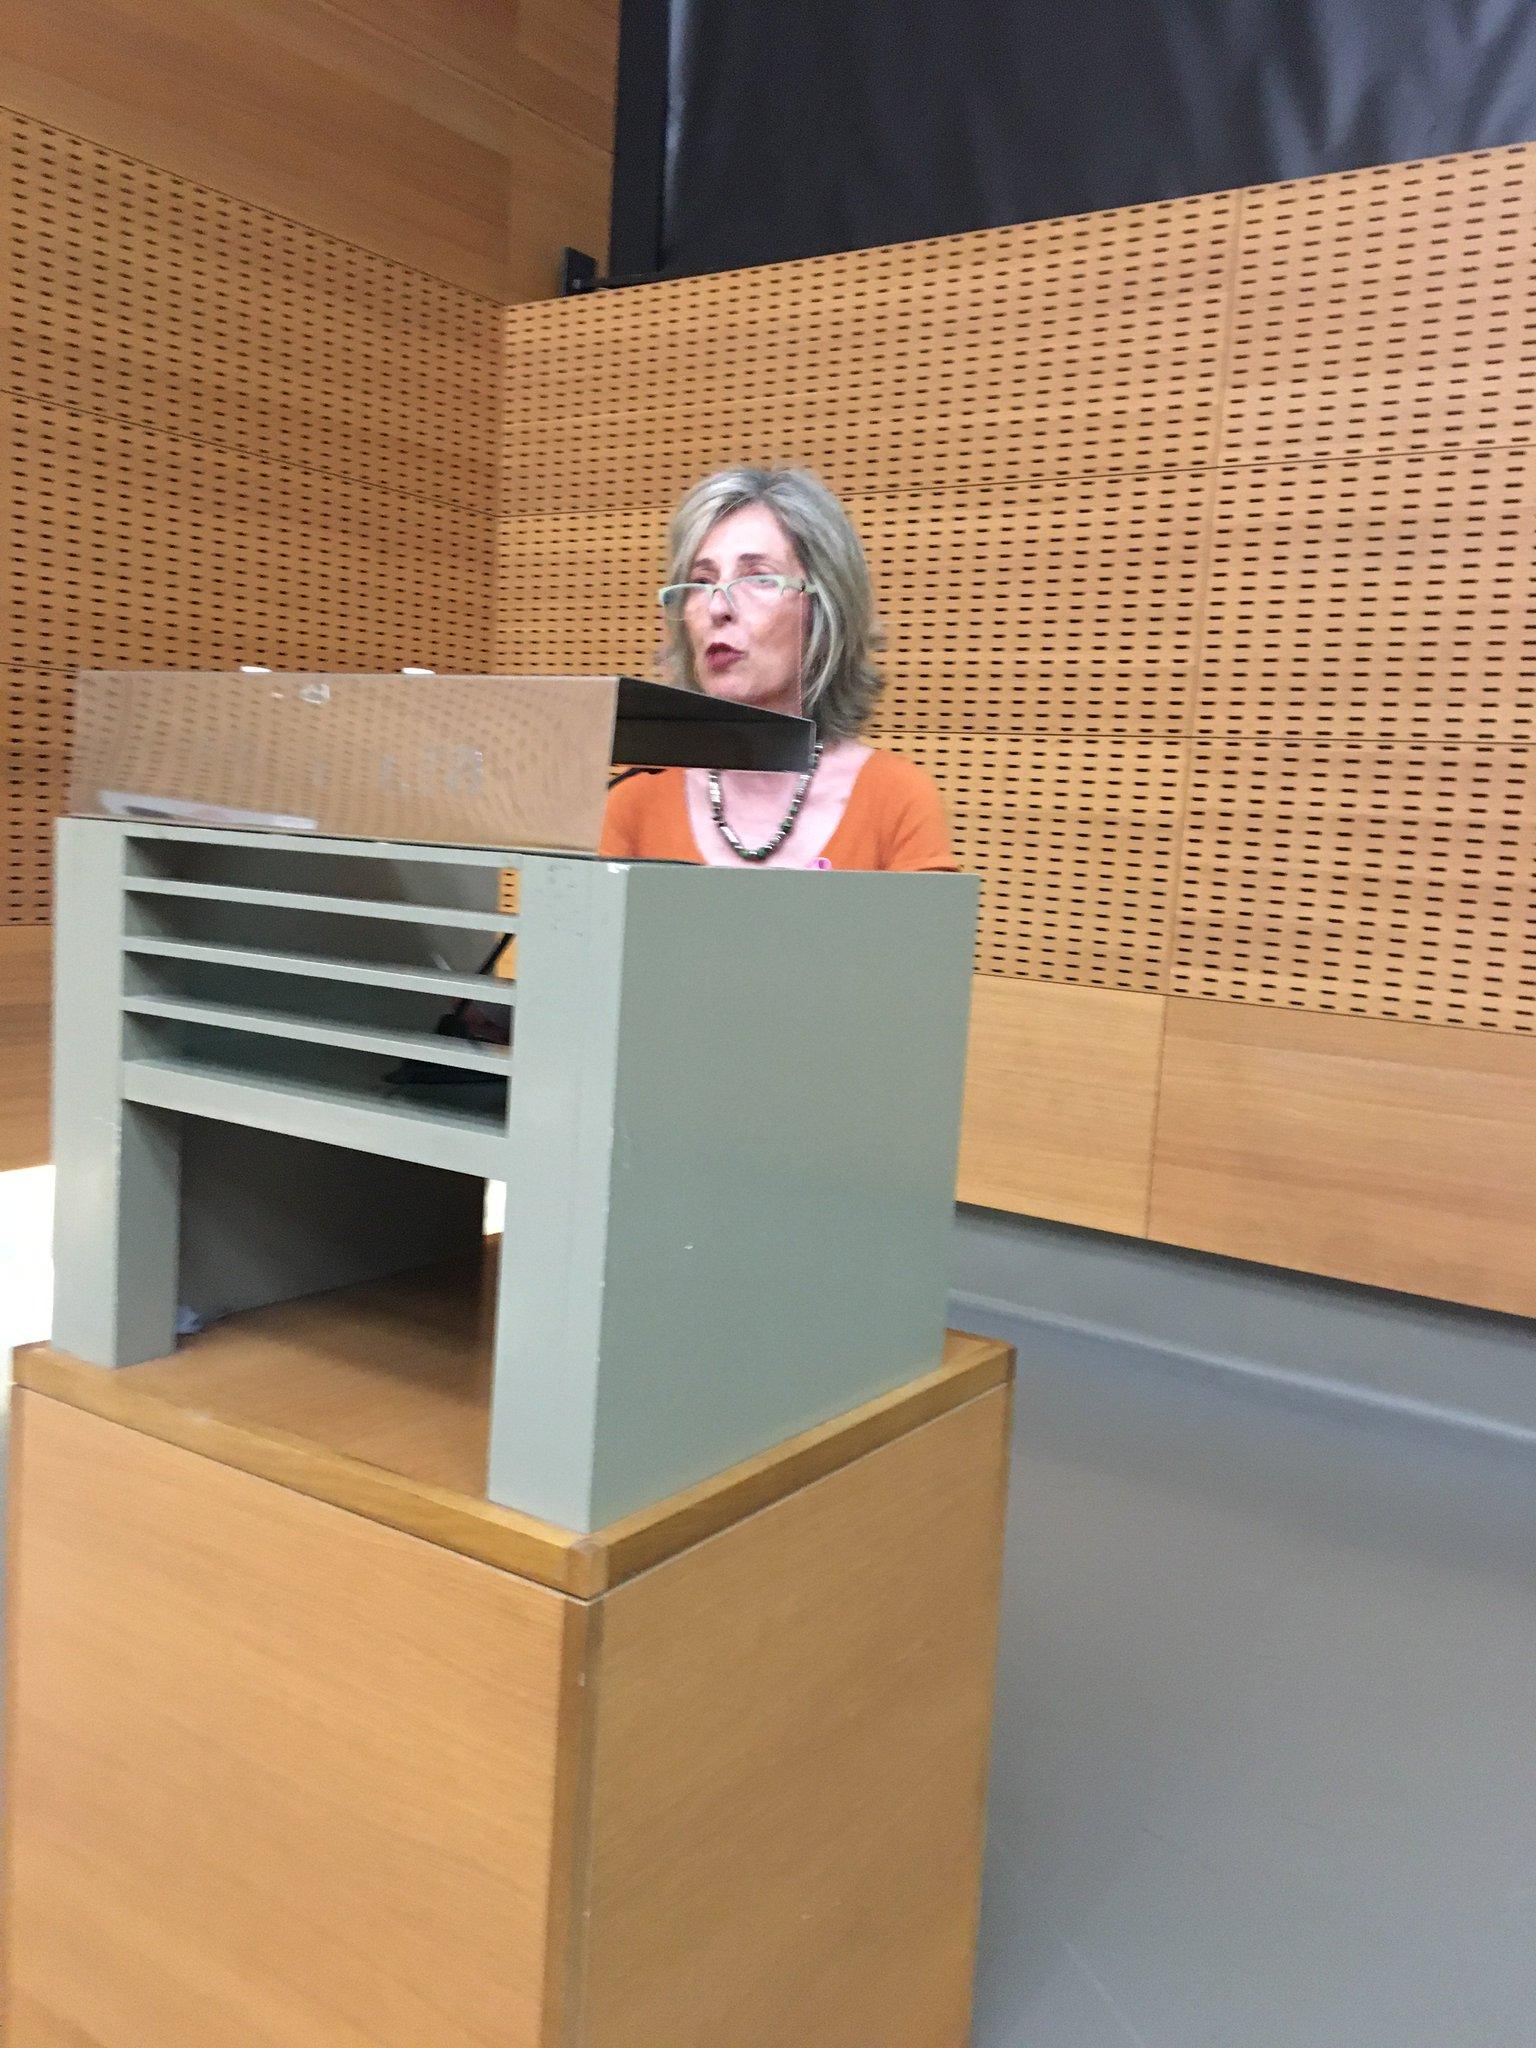 Ana Sarasa, presidenta de Saray, dando comienzo a la #JornadaSaray https://t.co/5B2oCvX5RX